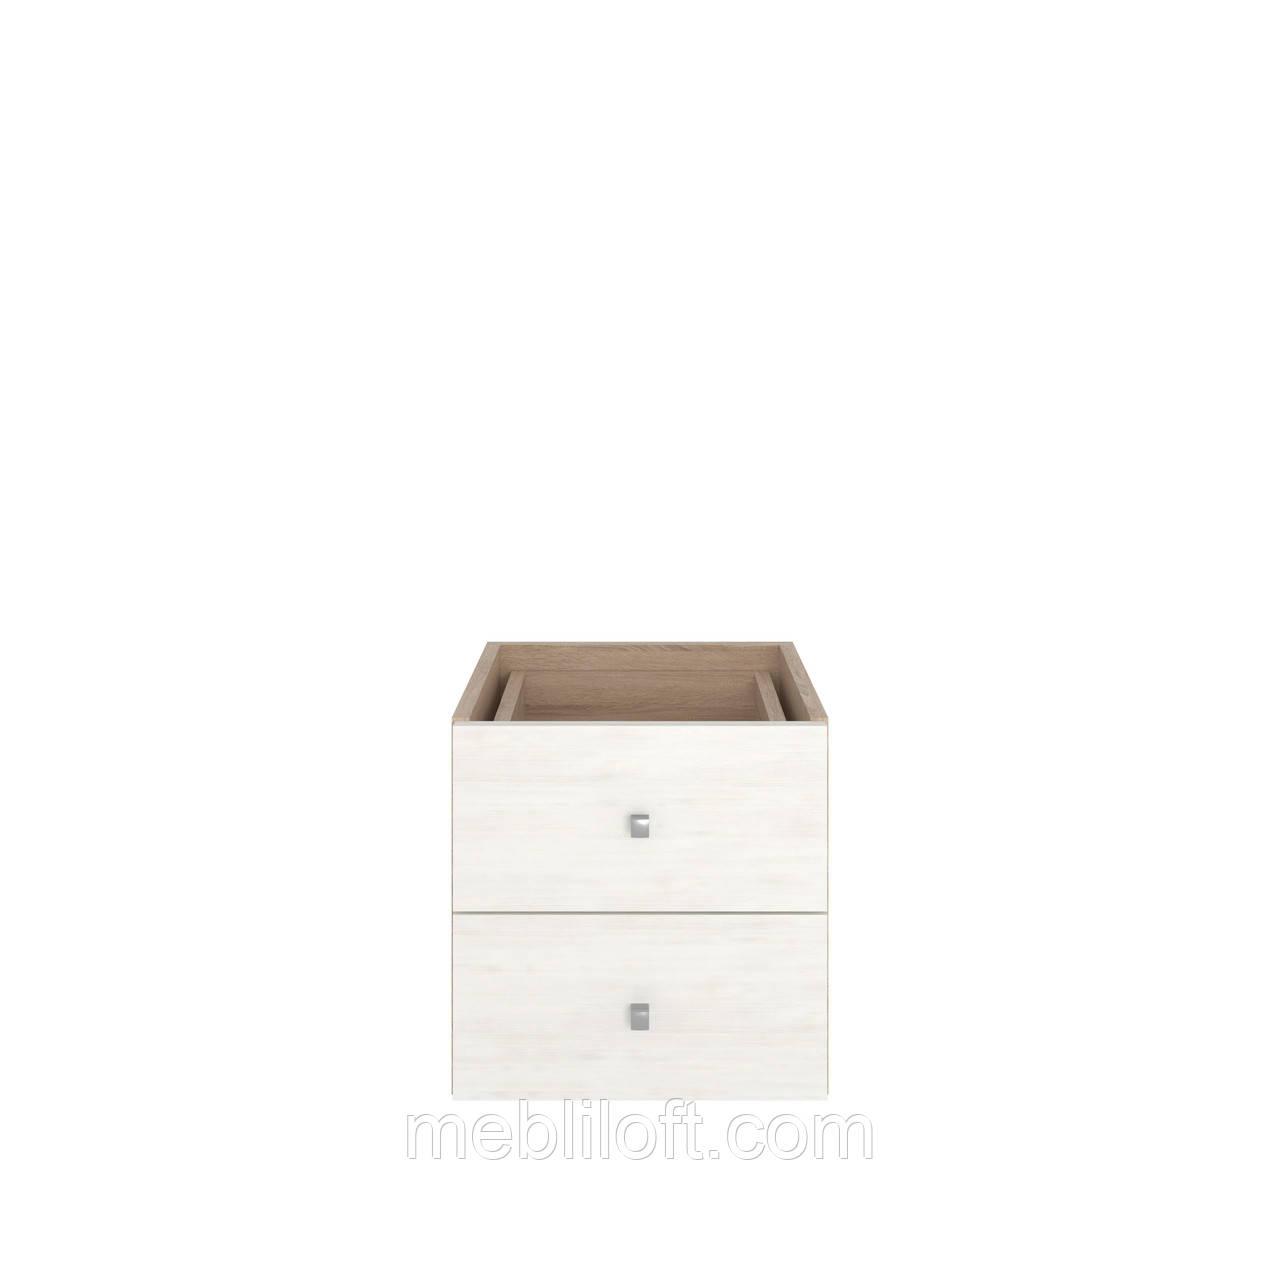 Коробка-вставка  с ящиками, фото 1